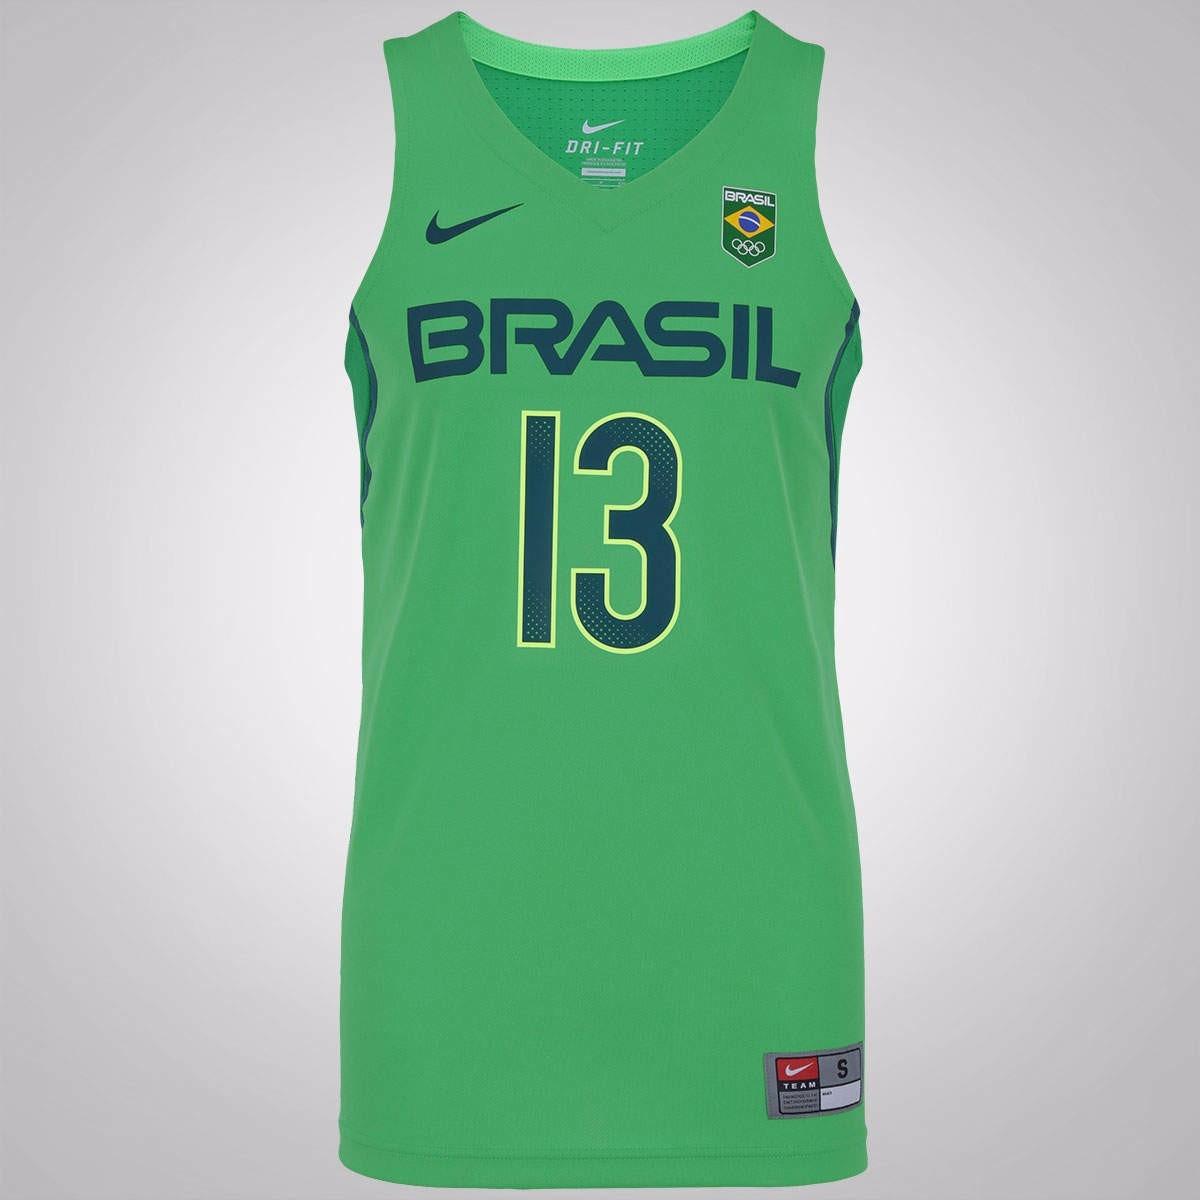 ed2b2932e camiseta nike basquete brasil olimpíadas - pronta entrega! Carregando zoom.